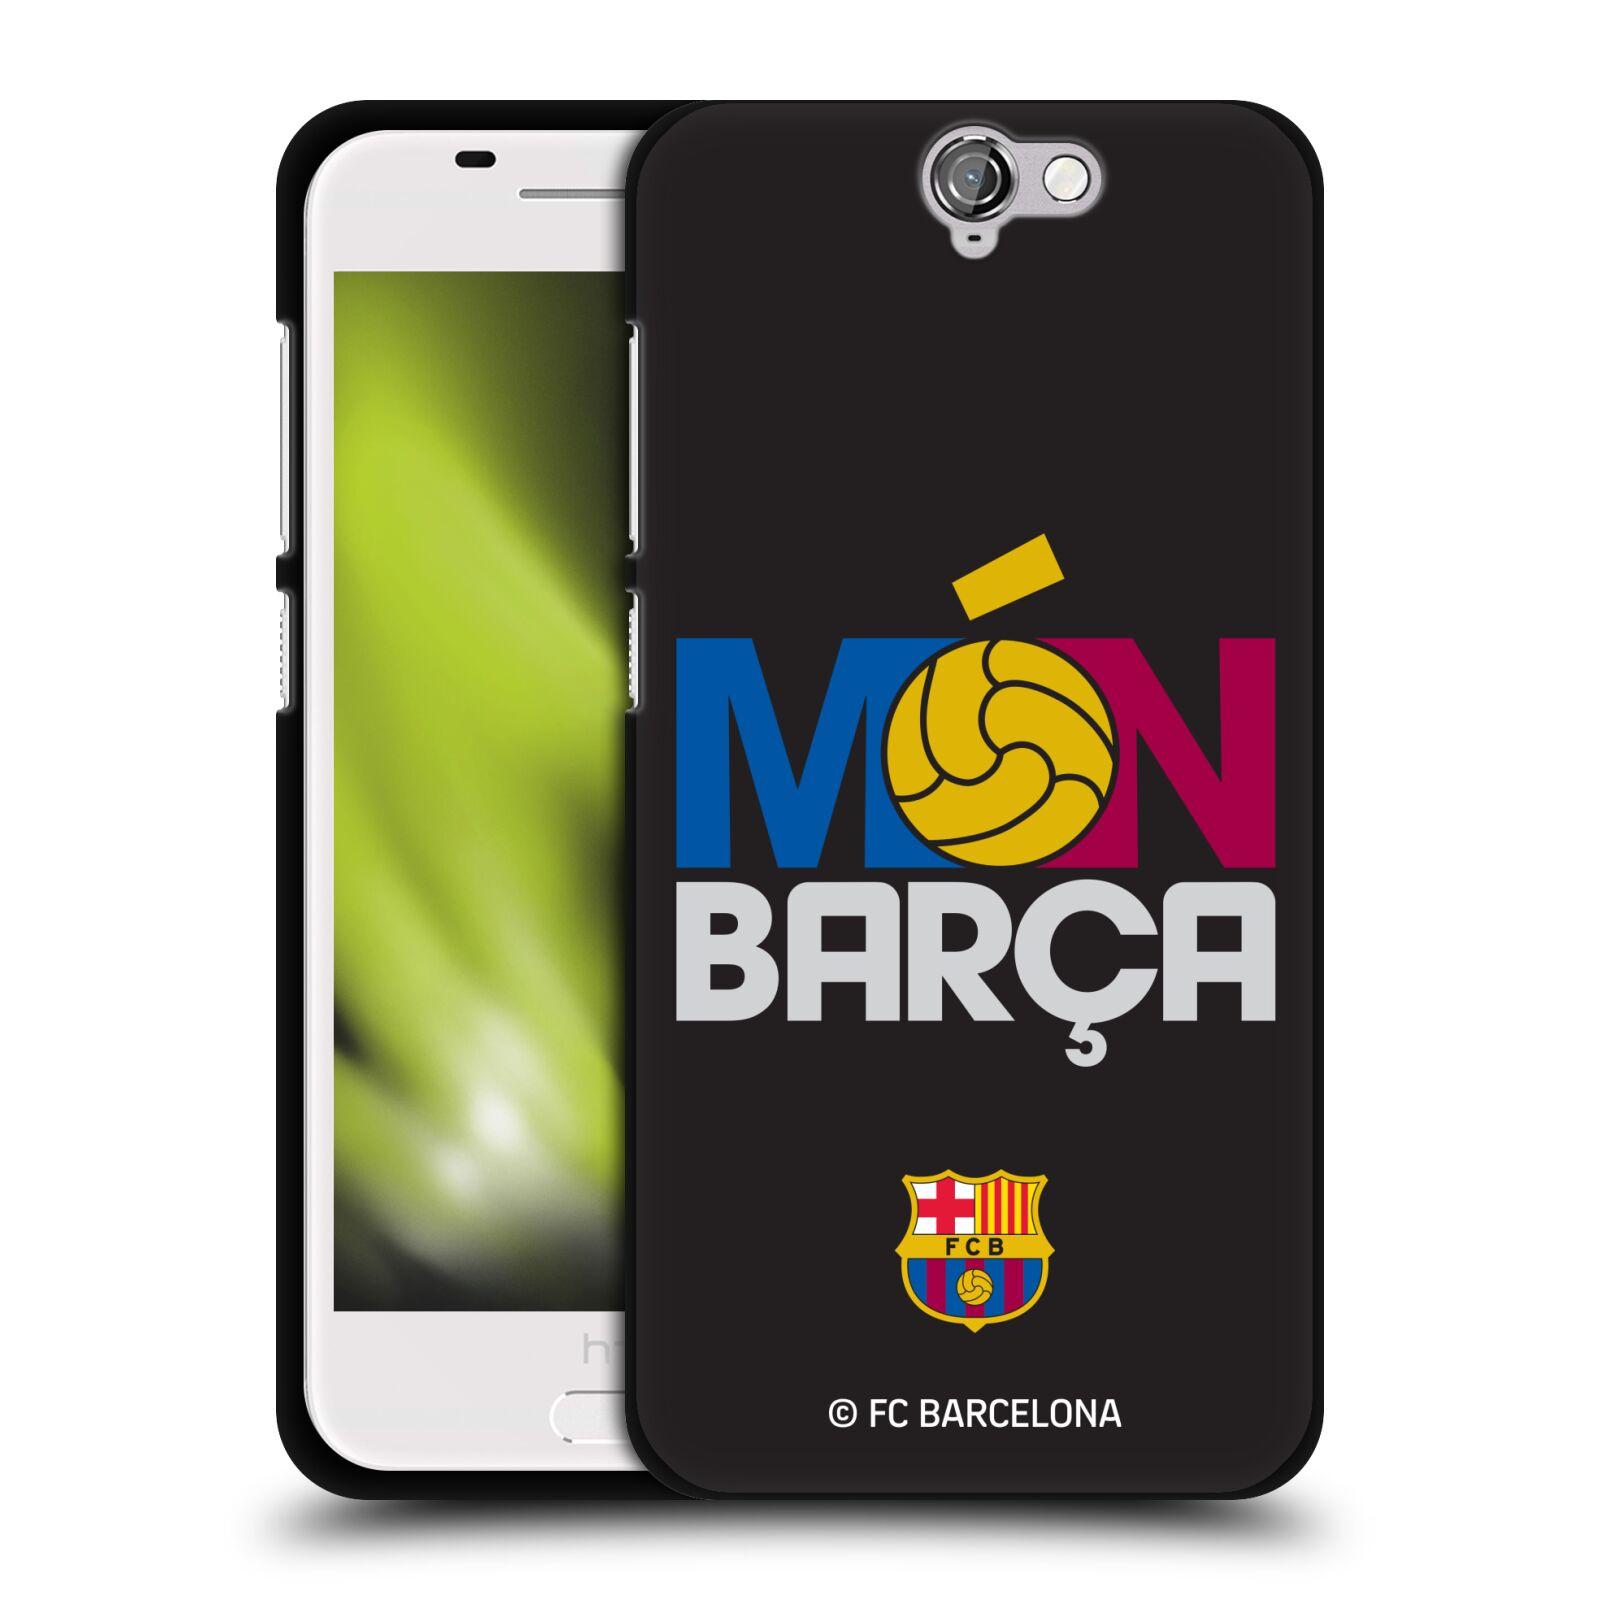 OFFICIAL-FC-BARCELONA-2017-18-CAMPIONS-BLACK-SOFT-GEL-CASE-FOR-HTC-PHONES